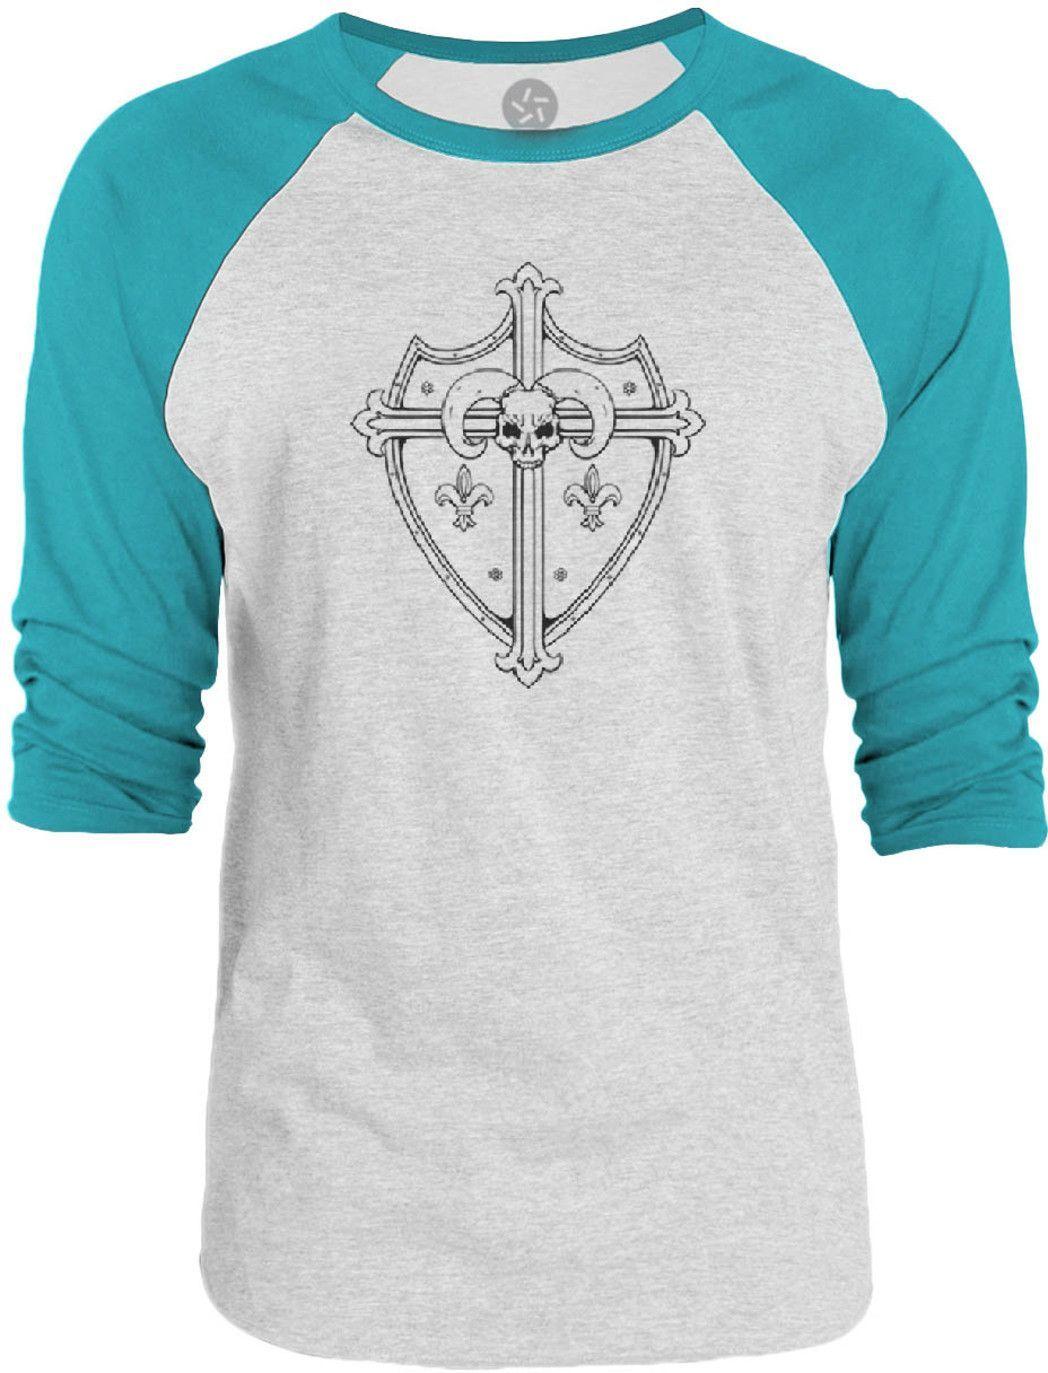 Big Texas Steel Ram Shield (Black) 3/4-Sleeve Raglan Baseball T-Shirt